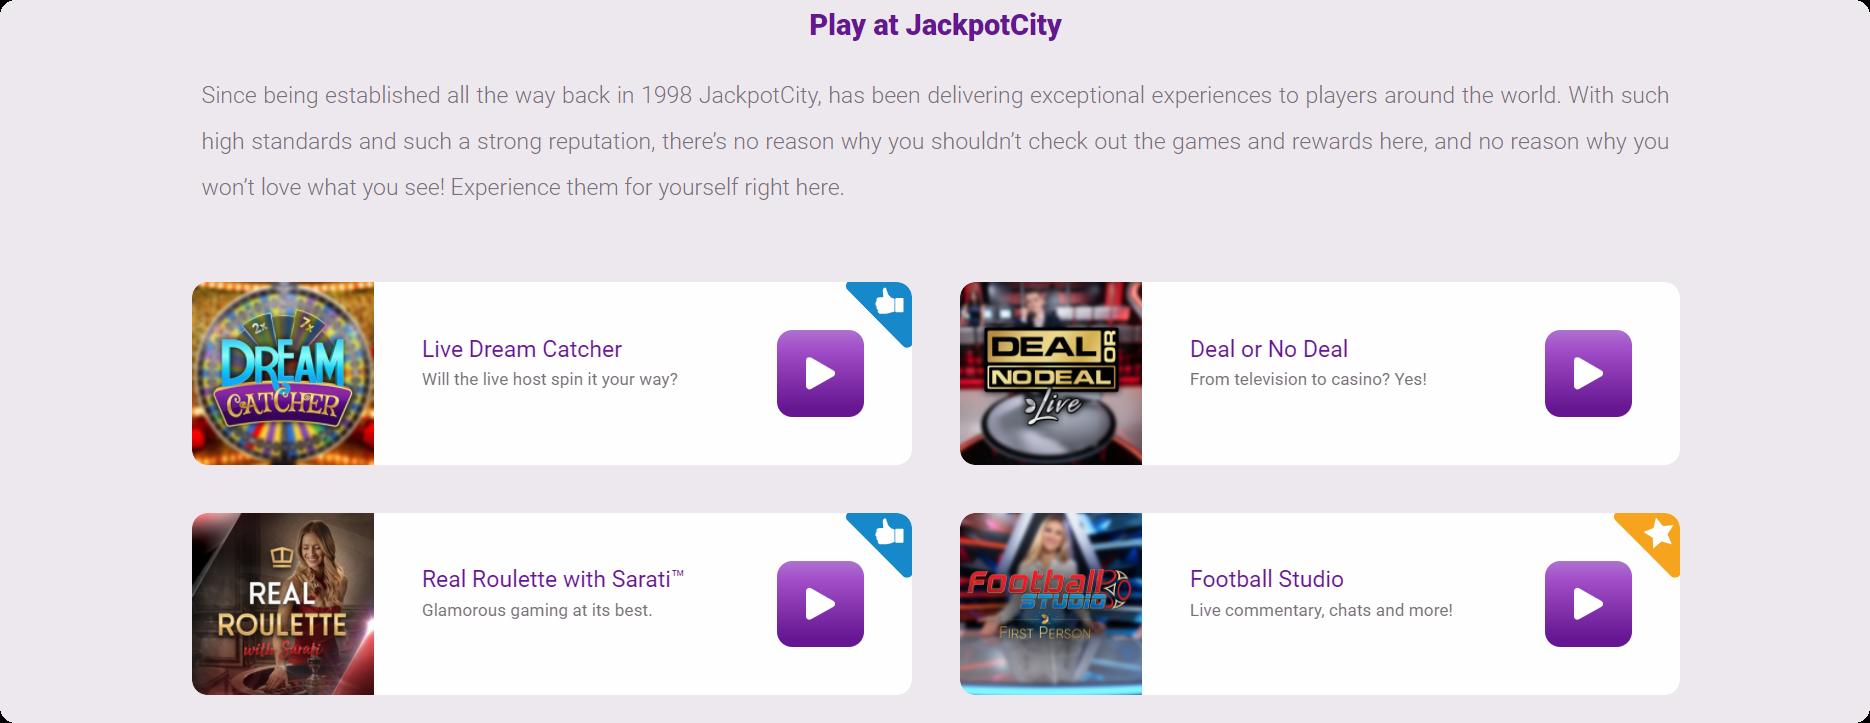 Jackpot City Live Casino games